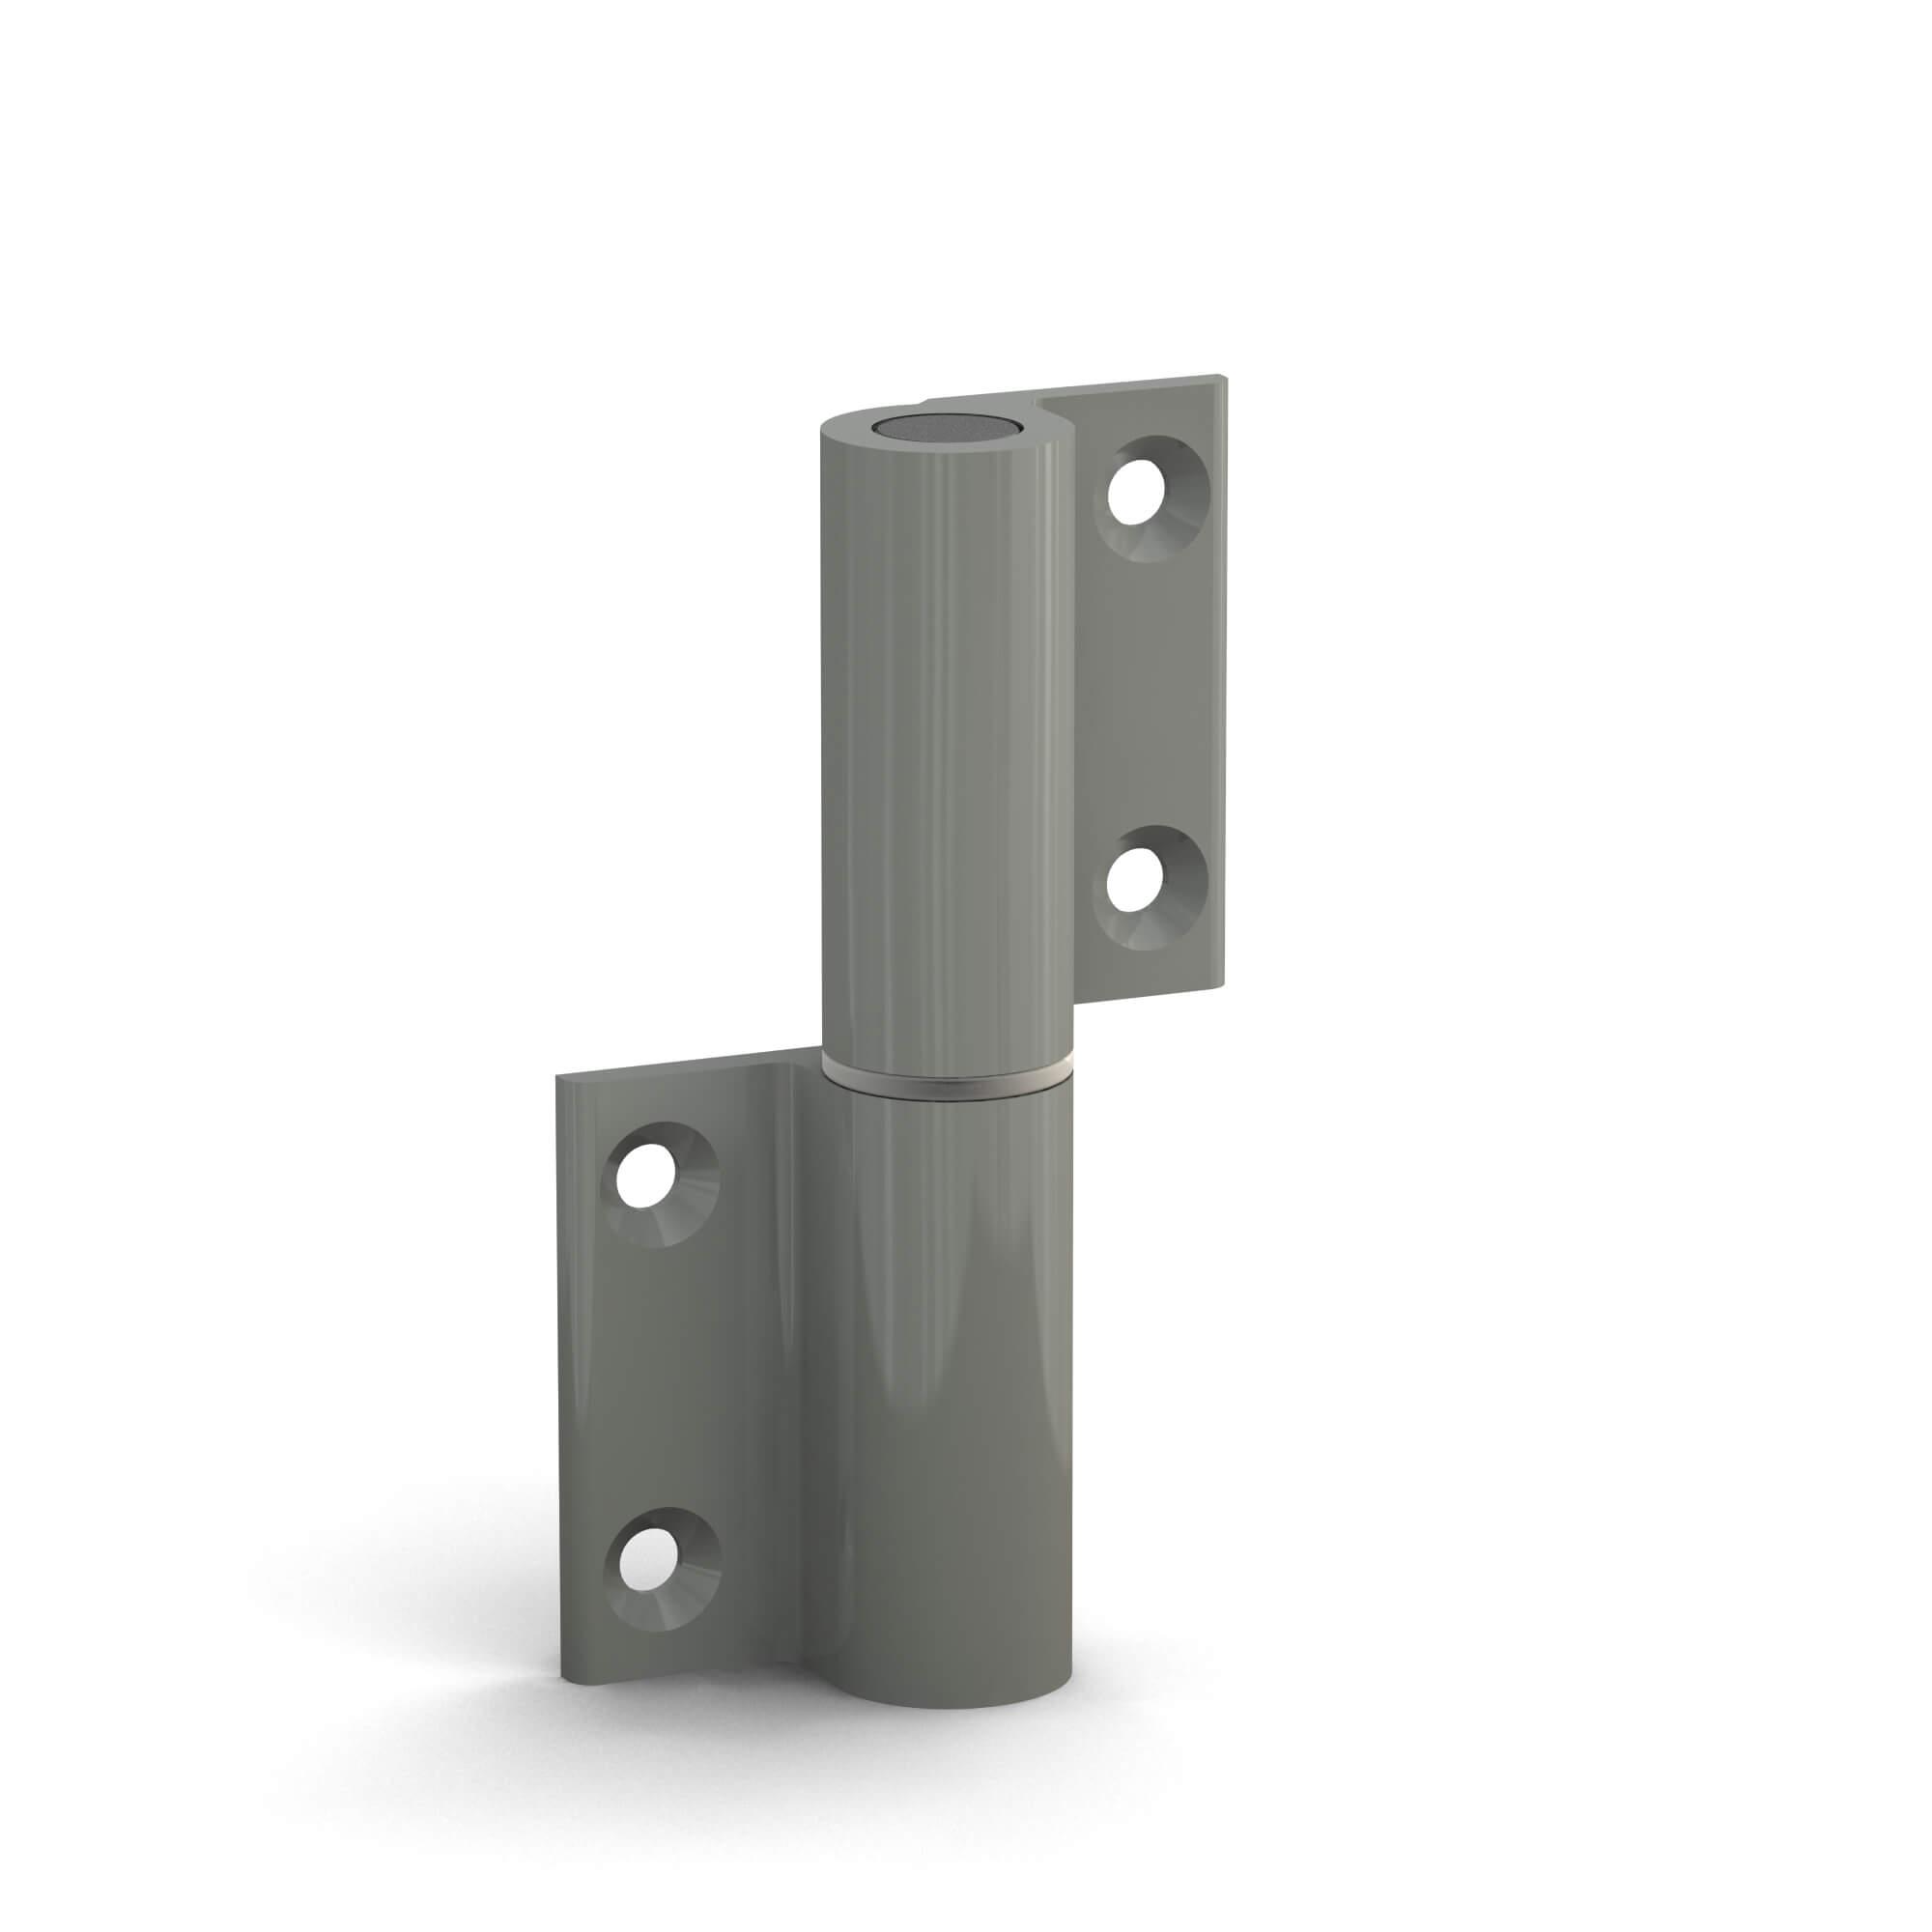 BUNT & PFIFFIG Doppelpack Möbelband Möbelscharnier Aufschraubband Türscharnier aus Aluminium Grau Achatgrau Hellgrau RAL 7038 DIN-Richtung: Links - aufschraubbar